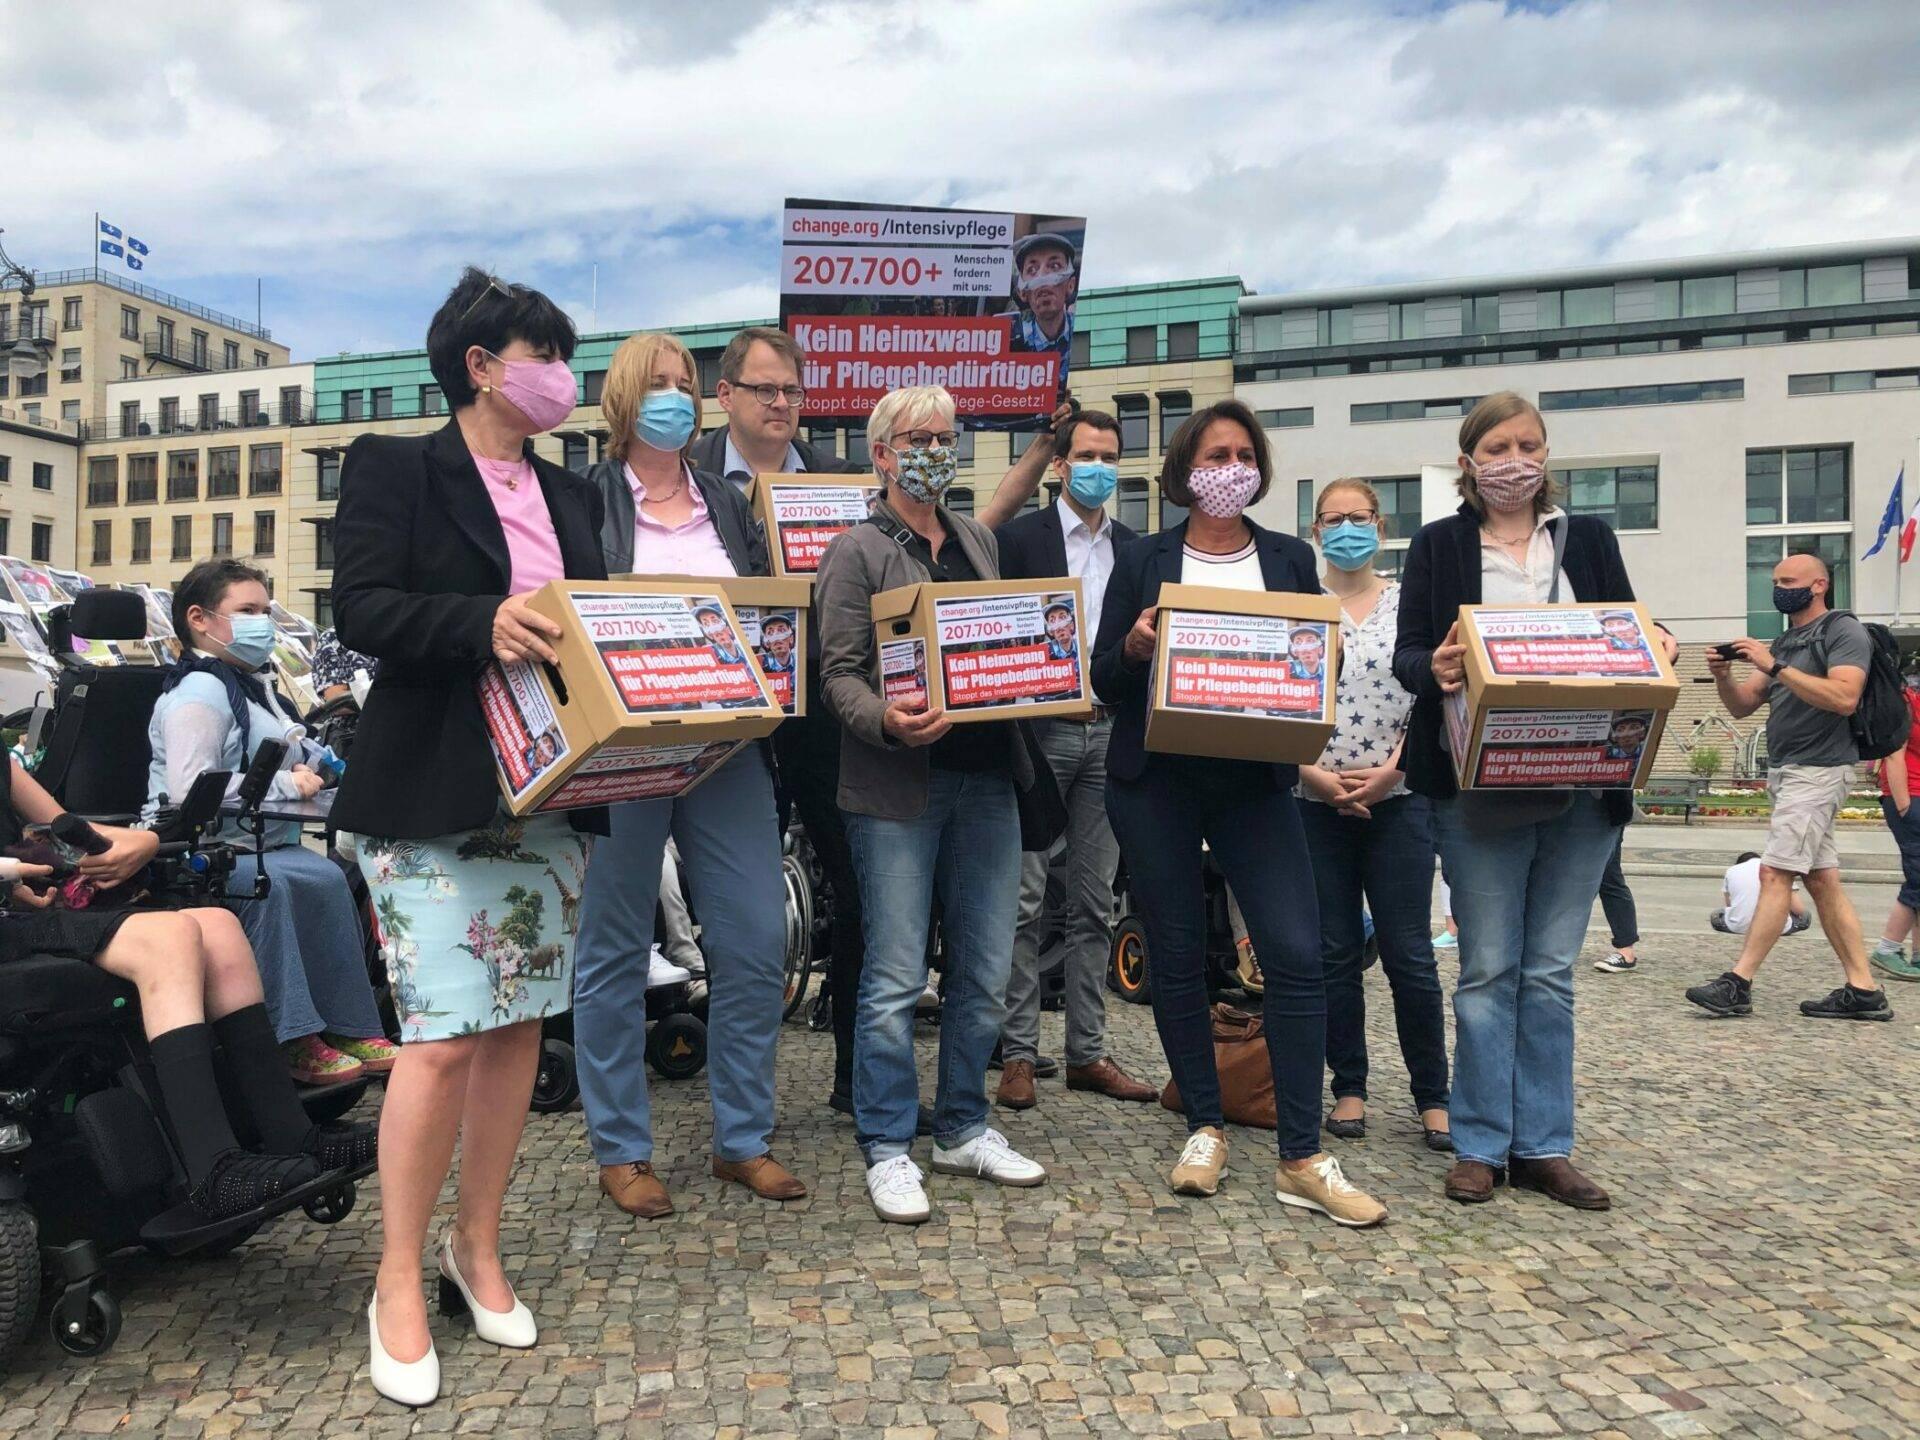 Politiker demonstrieren gegen IPReG in Berlin